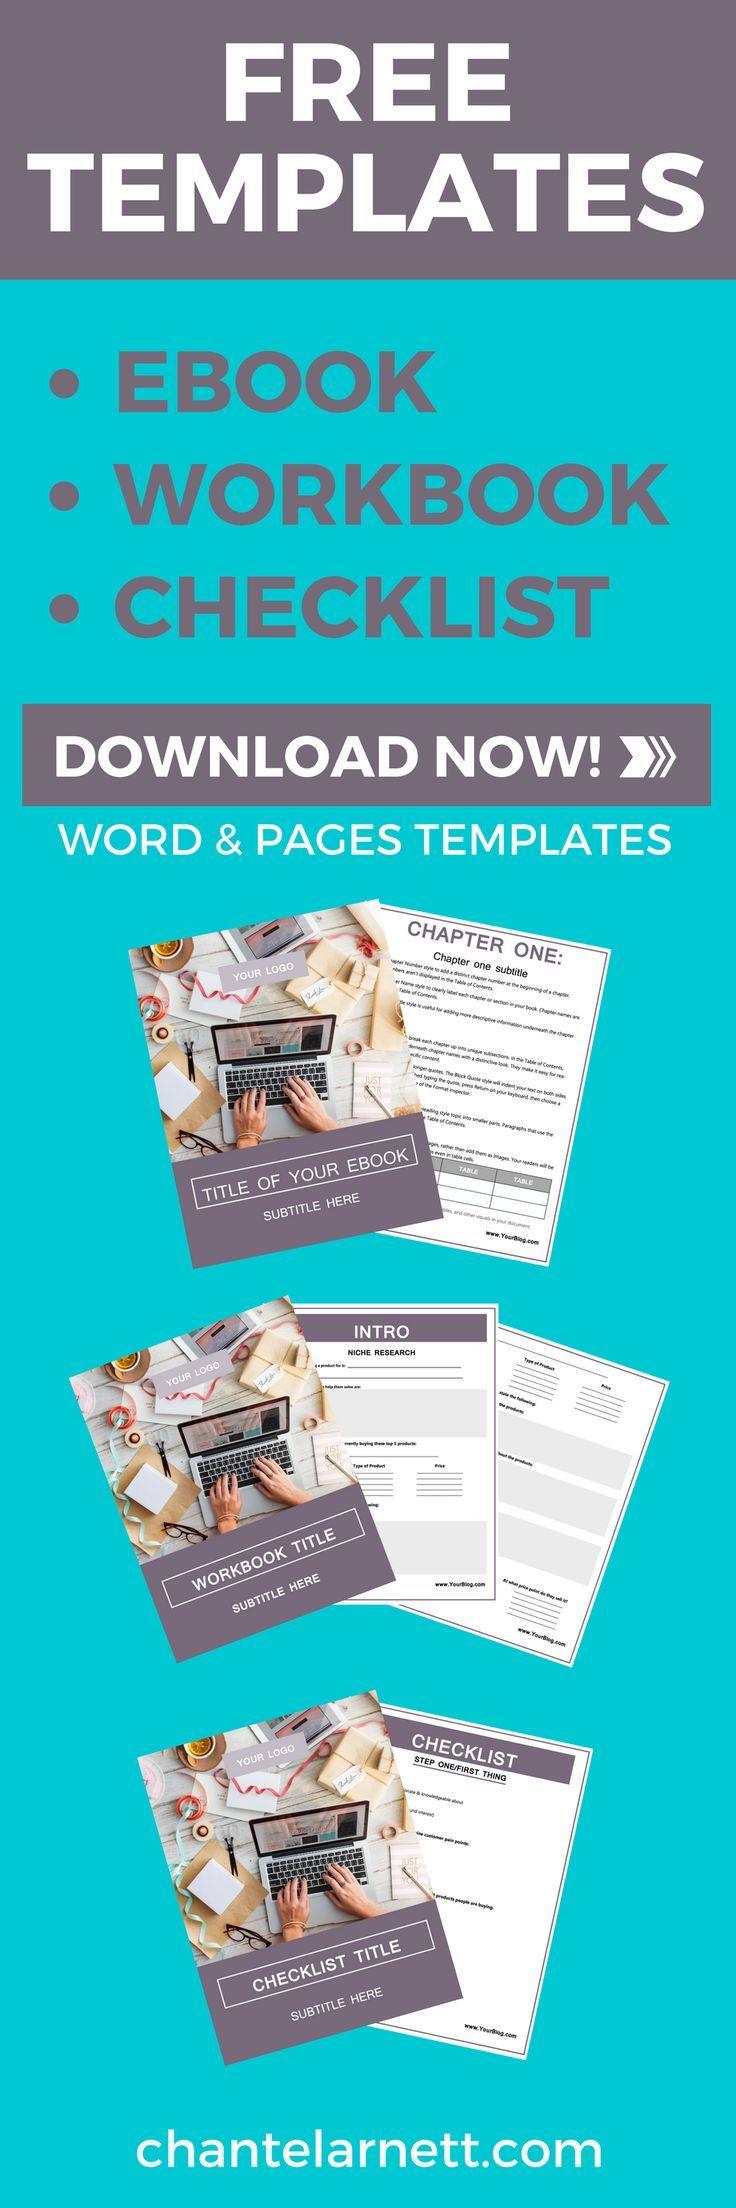 workbook templates free